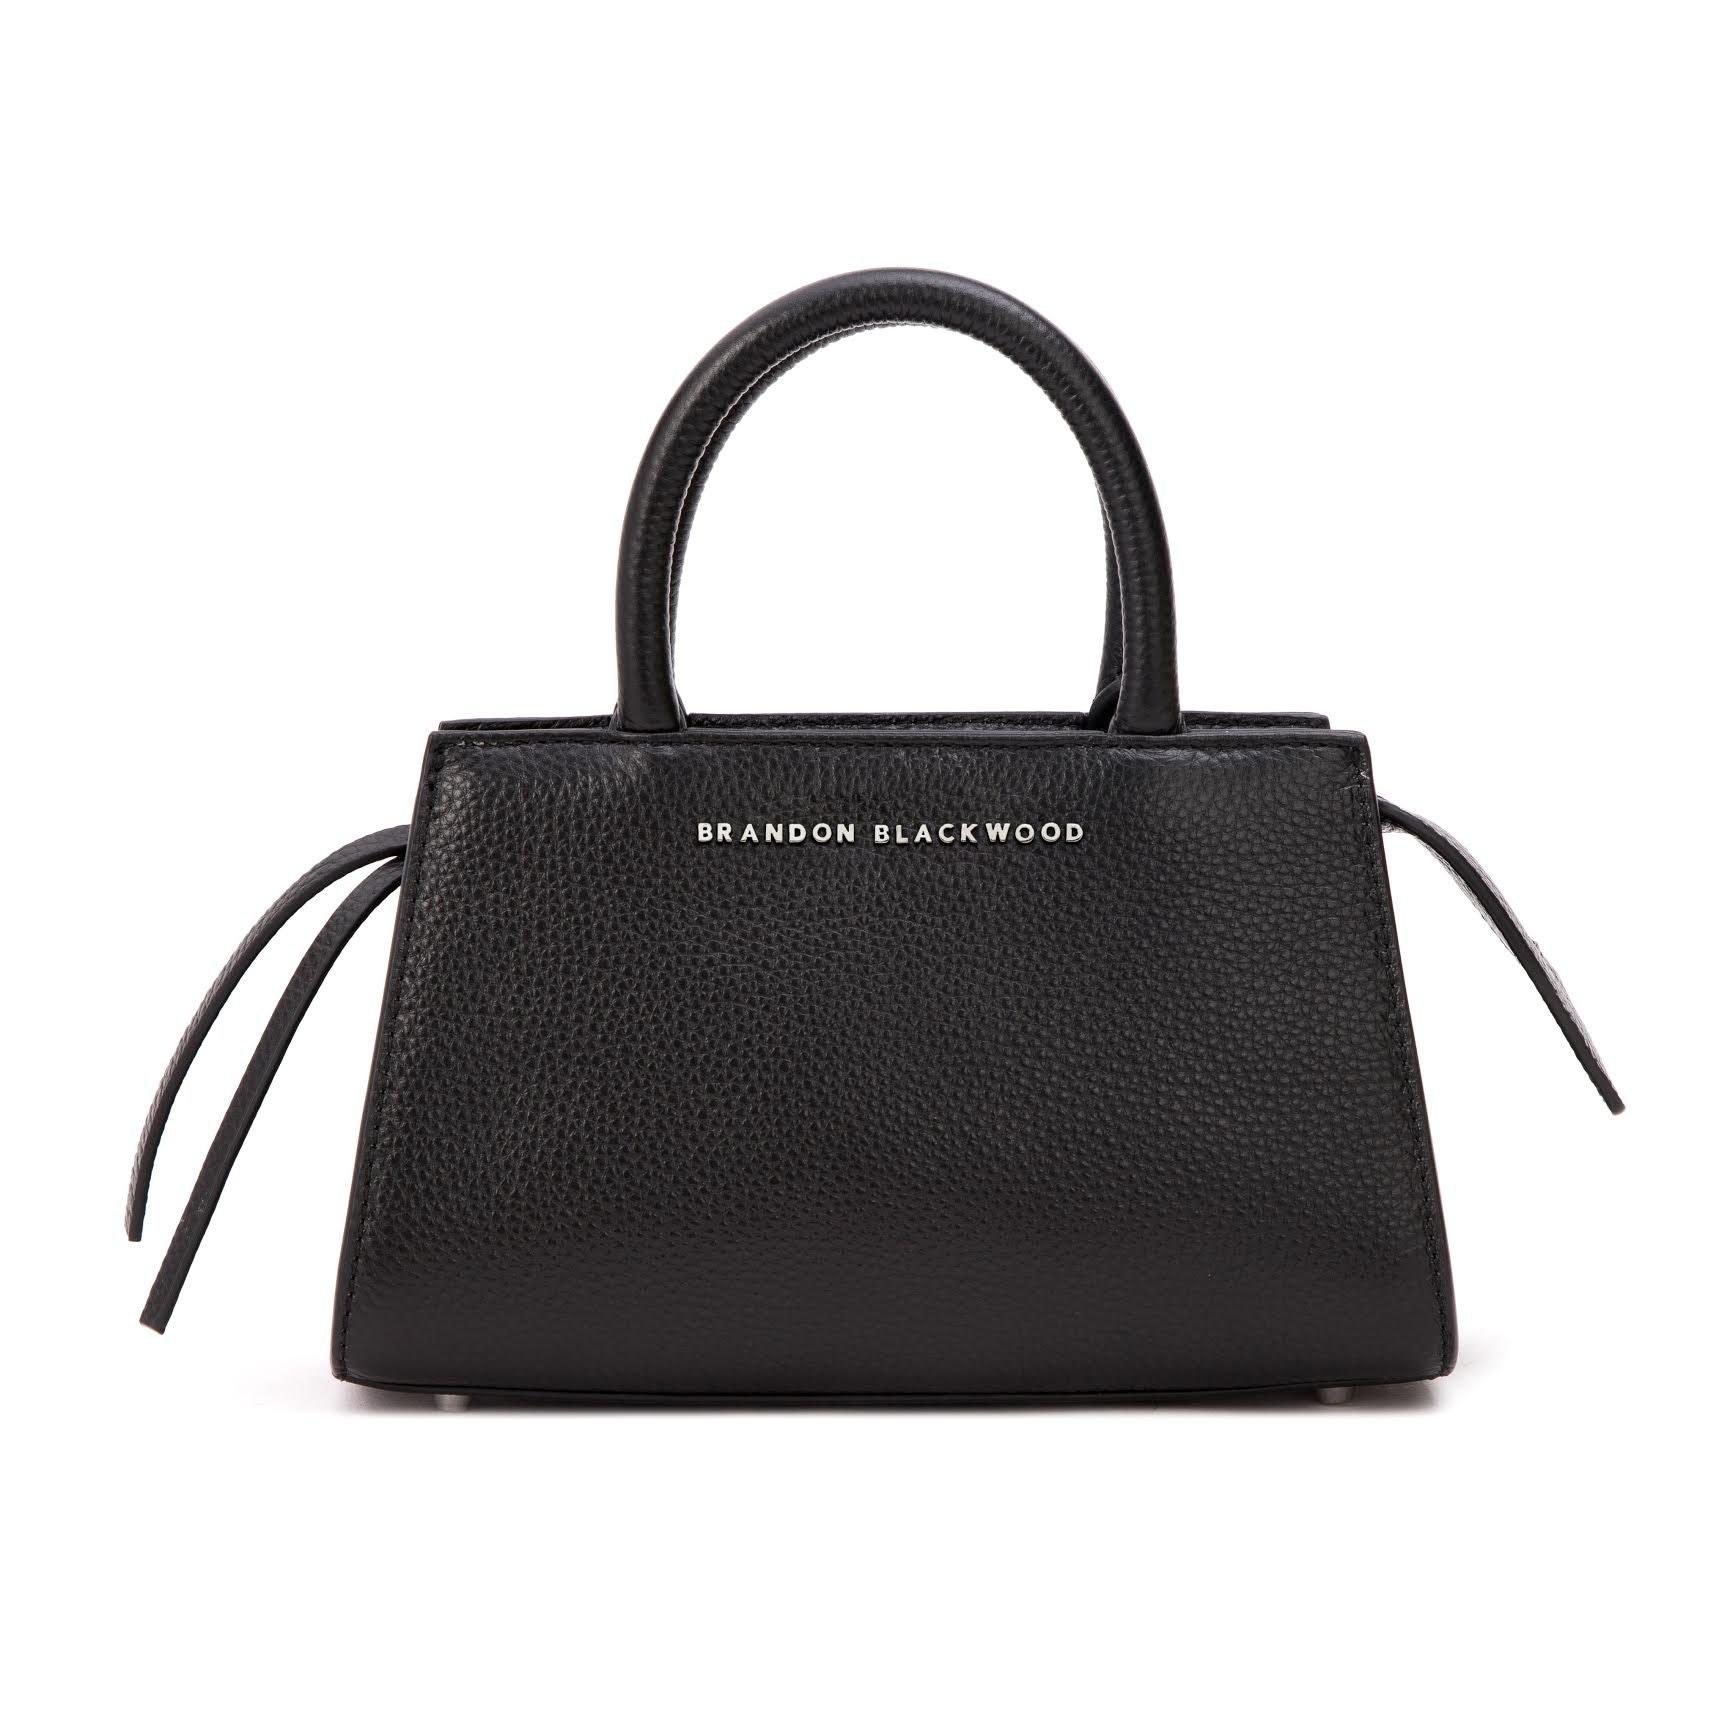 Brandon Blackwood Handbag